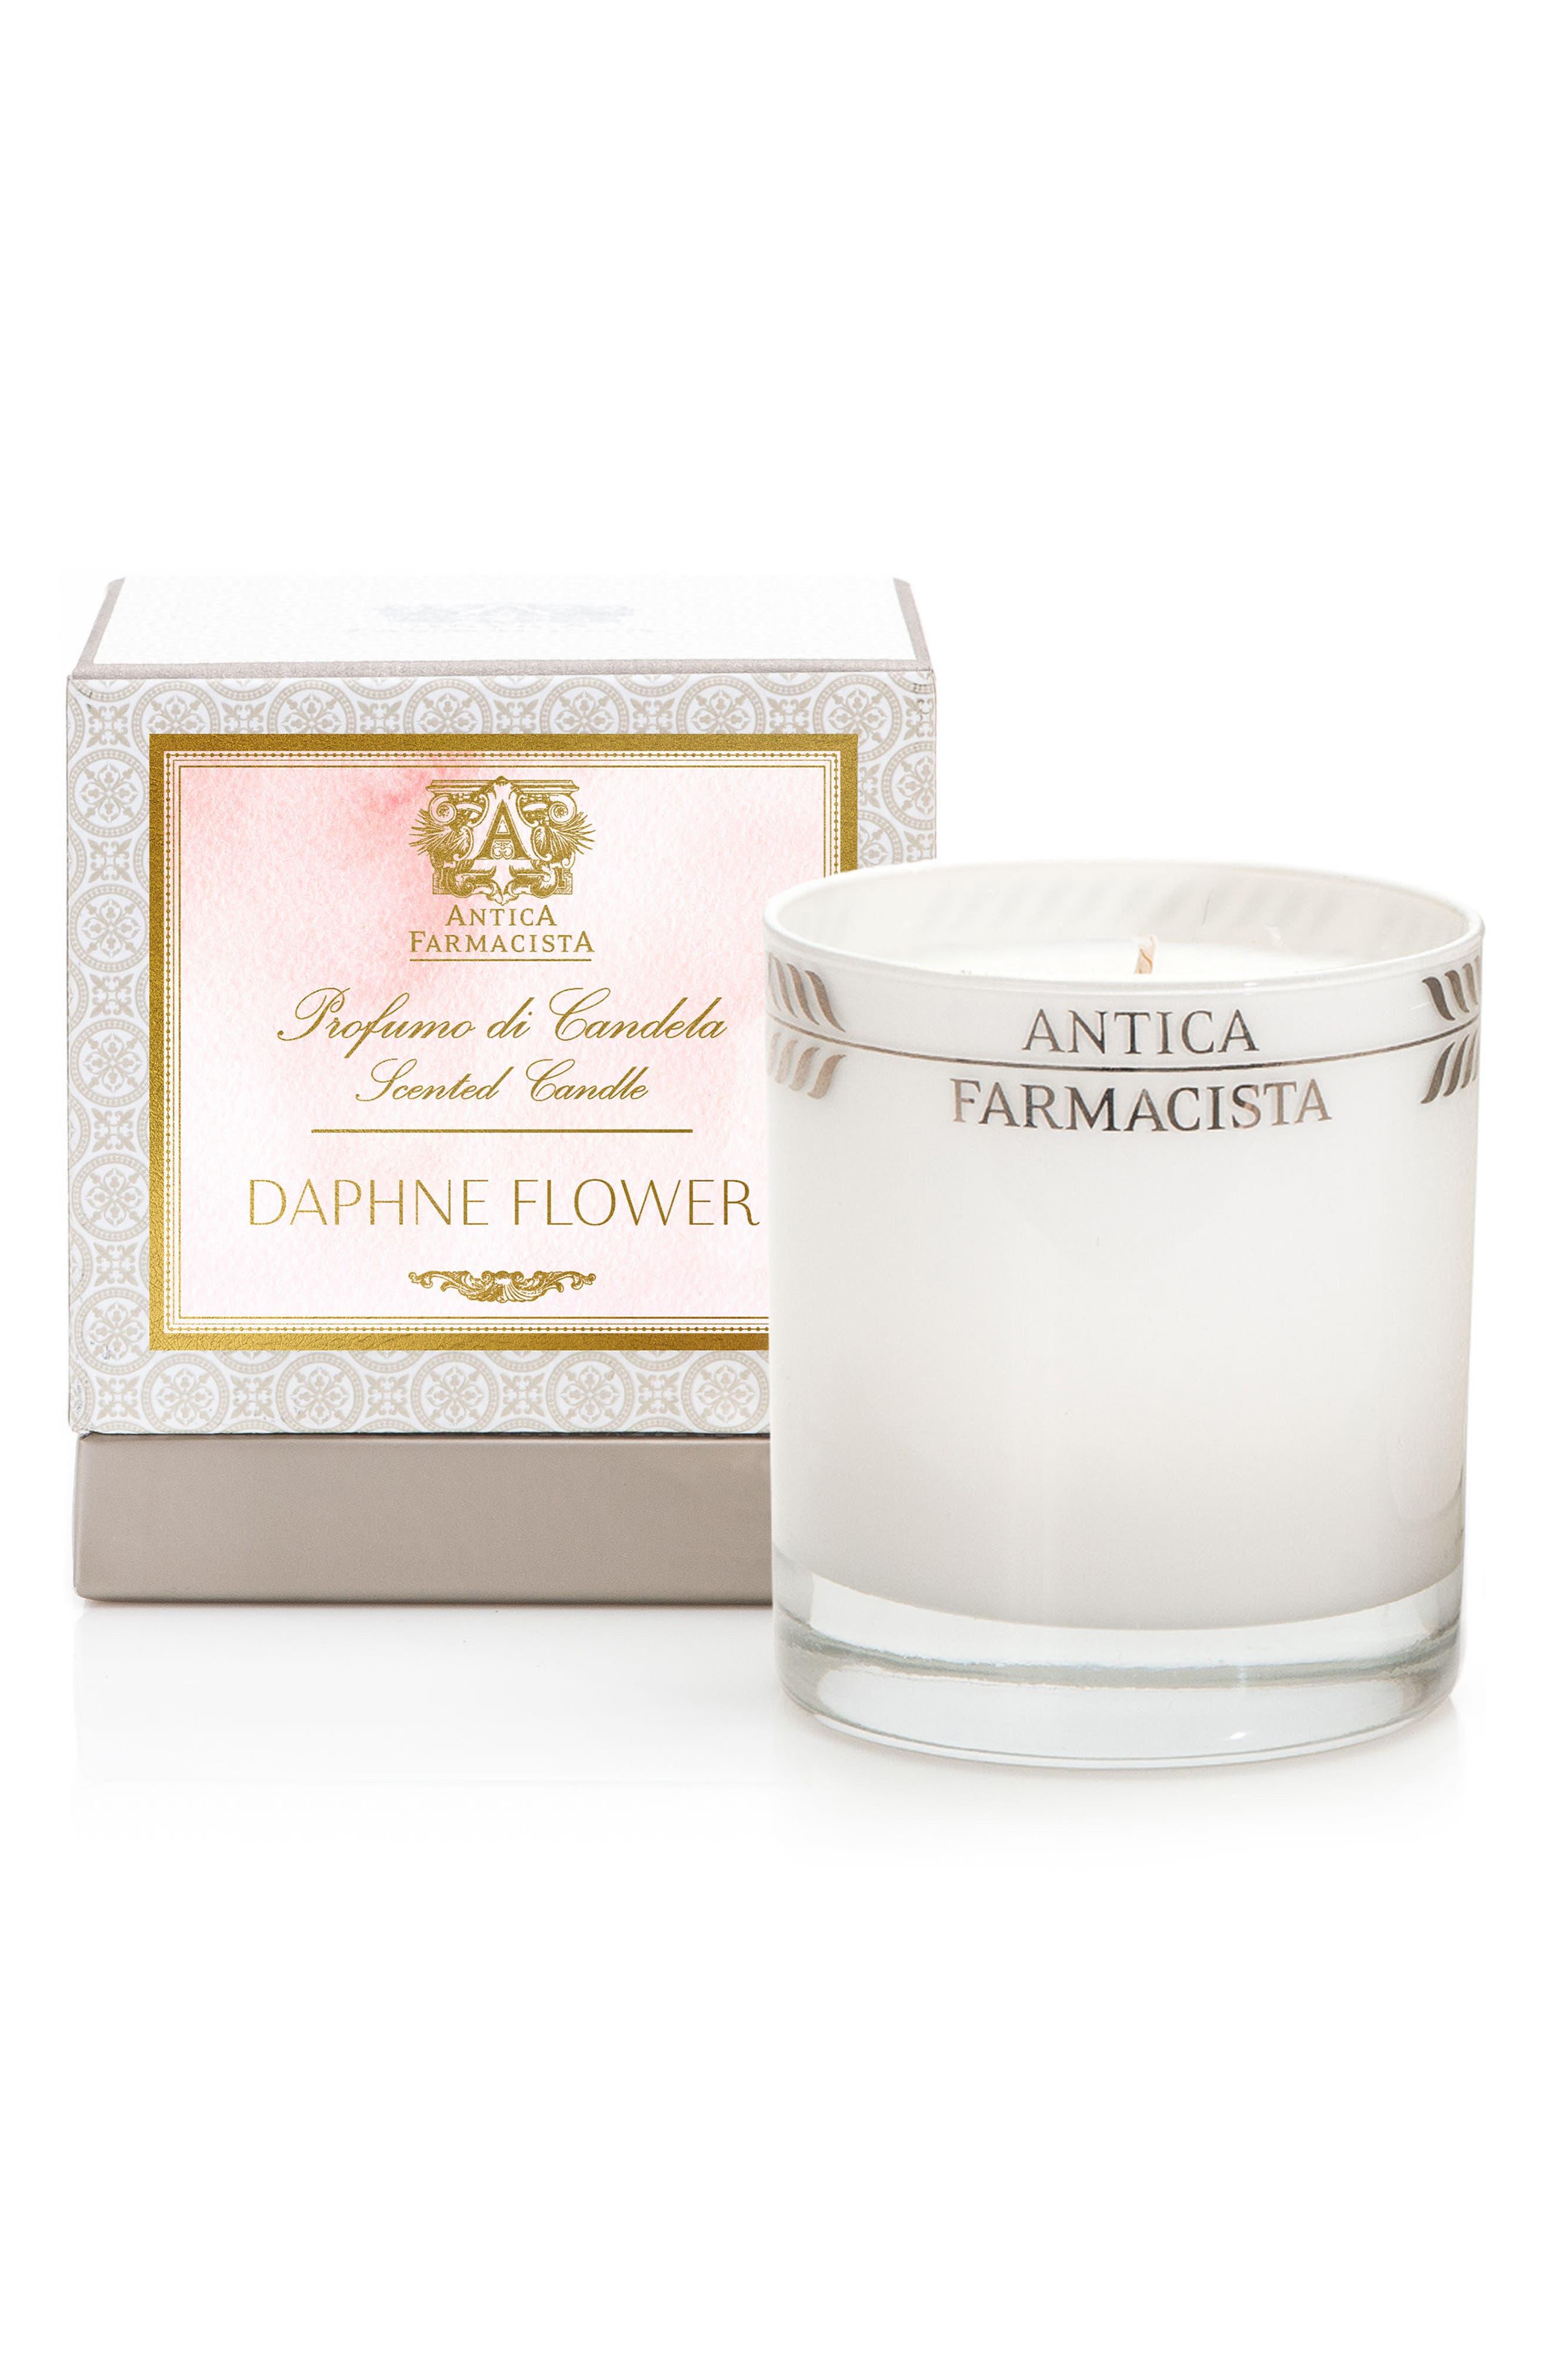 Antica Farmacista Daphne Flower Candle